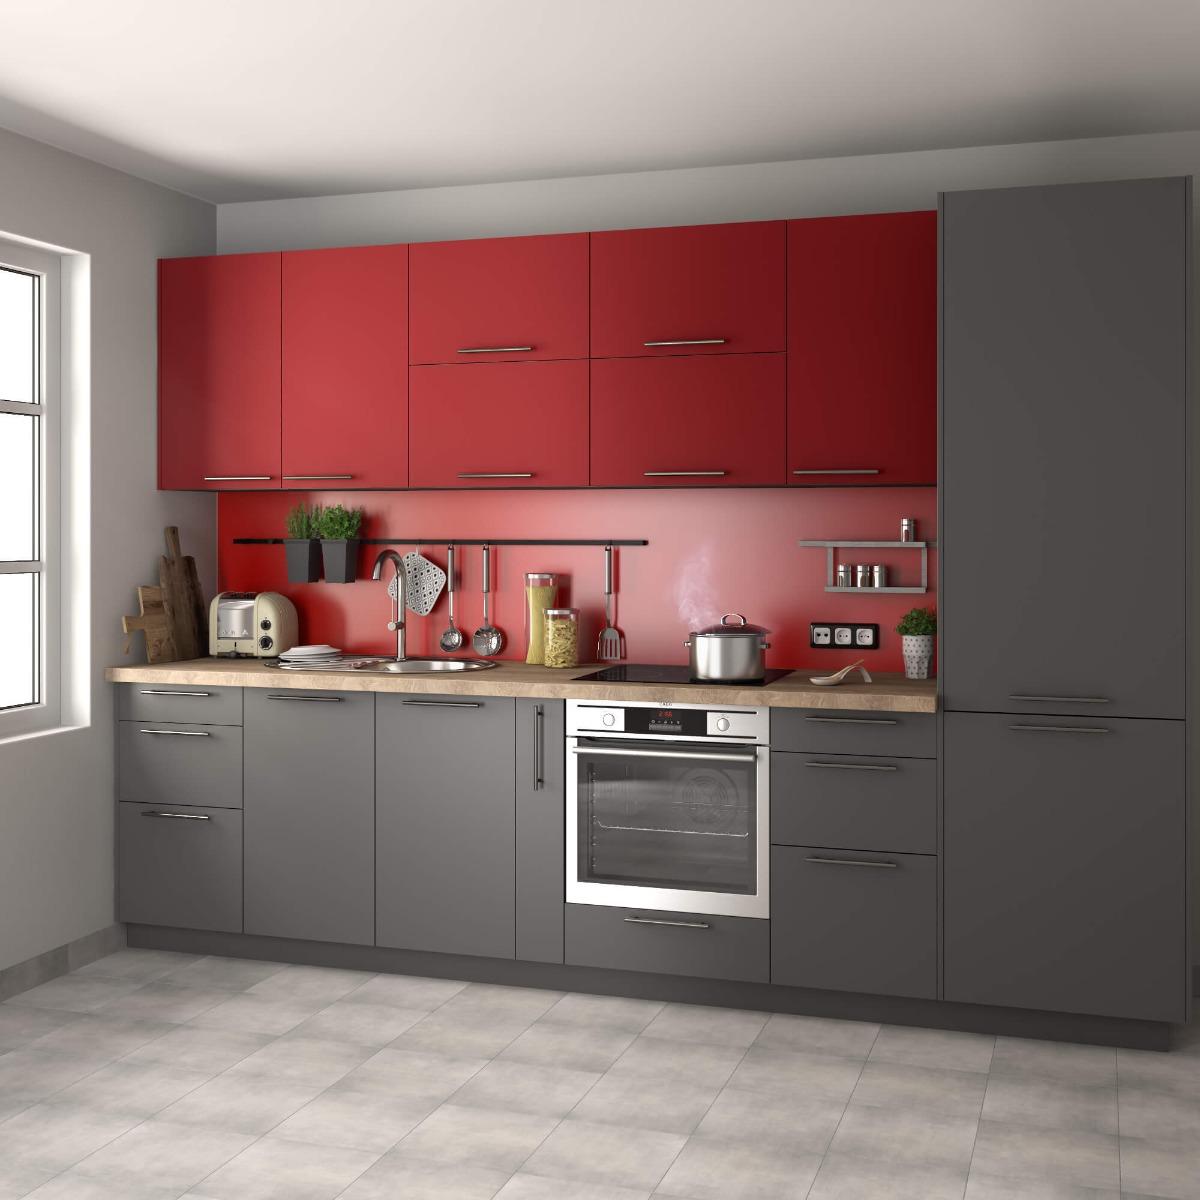 Delinia Sofia Red Designer Kitchen Mobi - Example 4